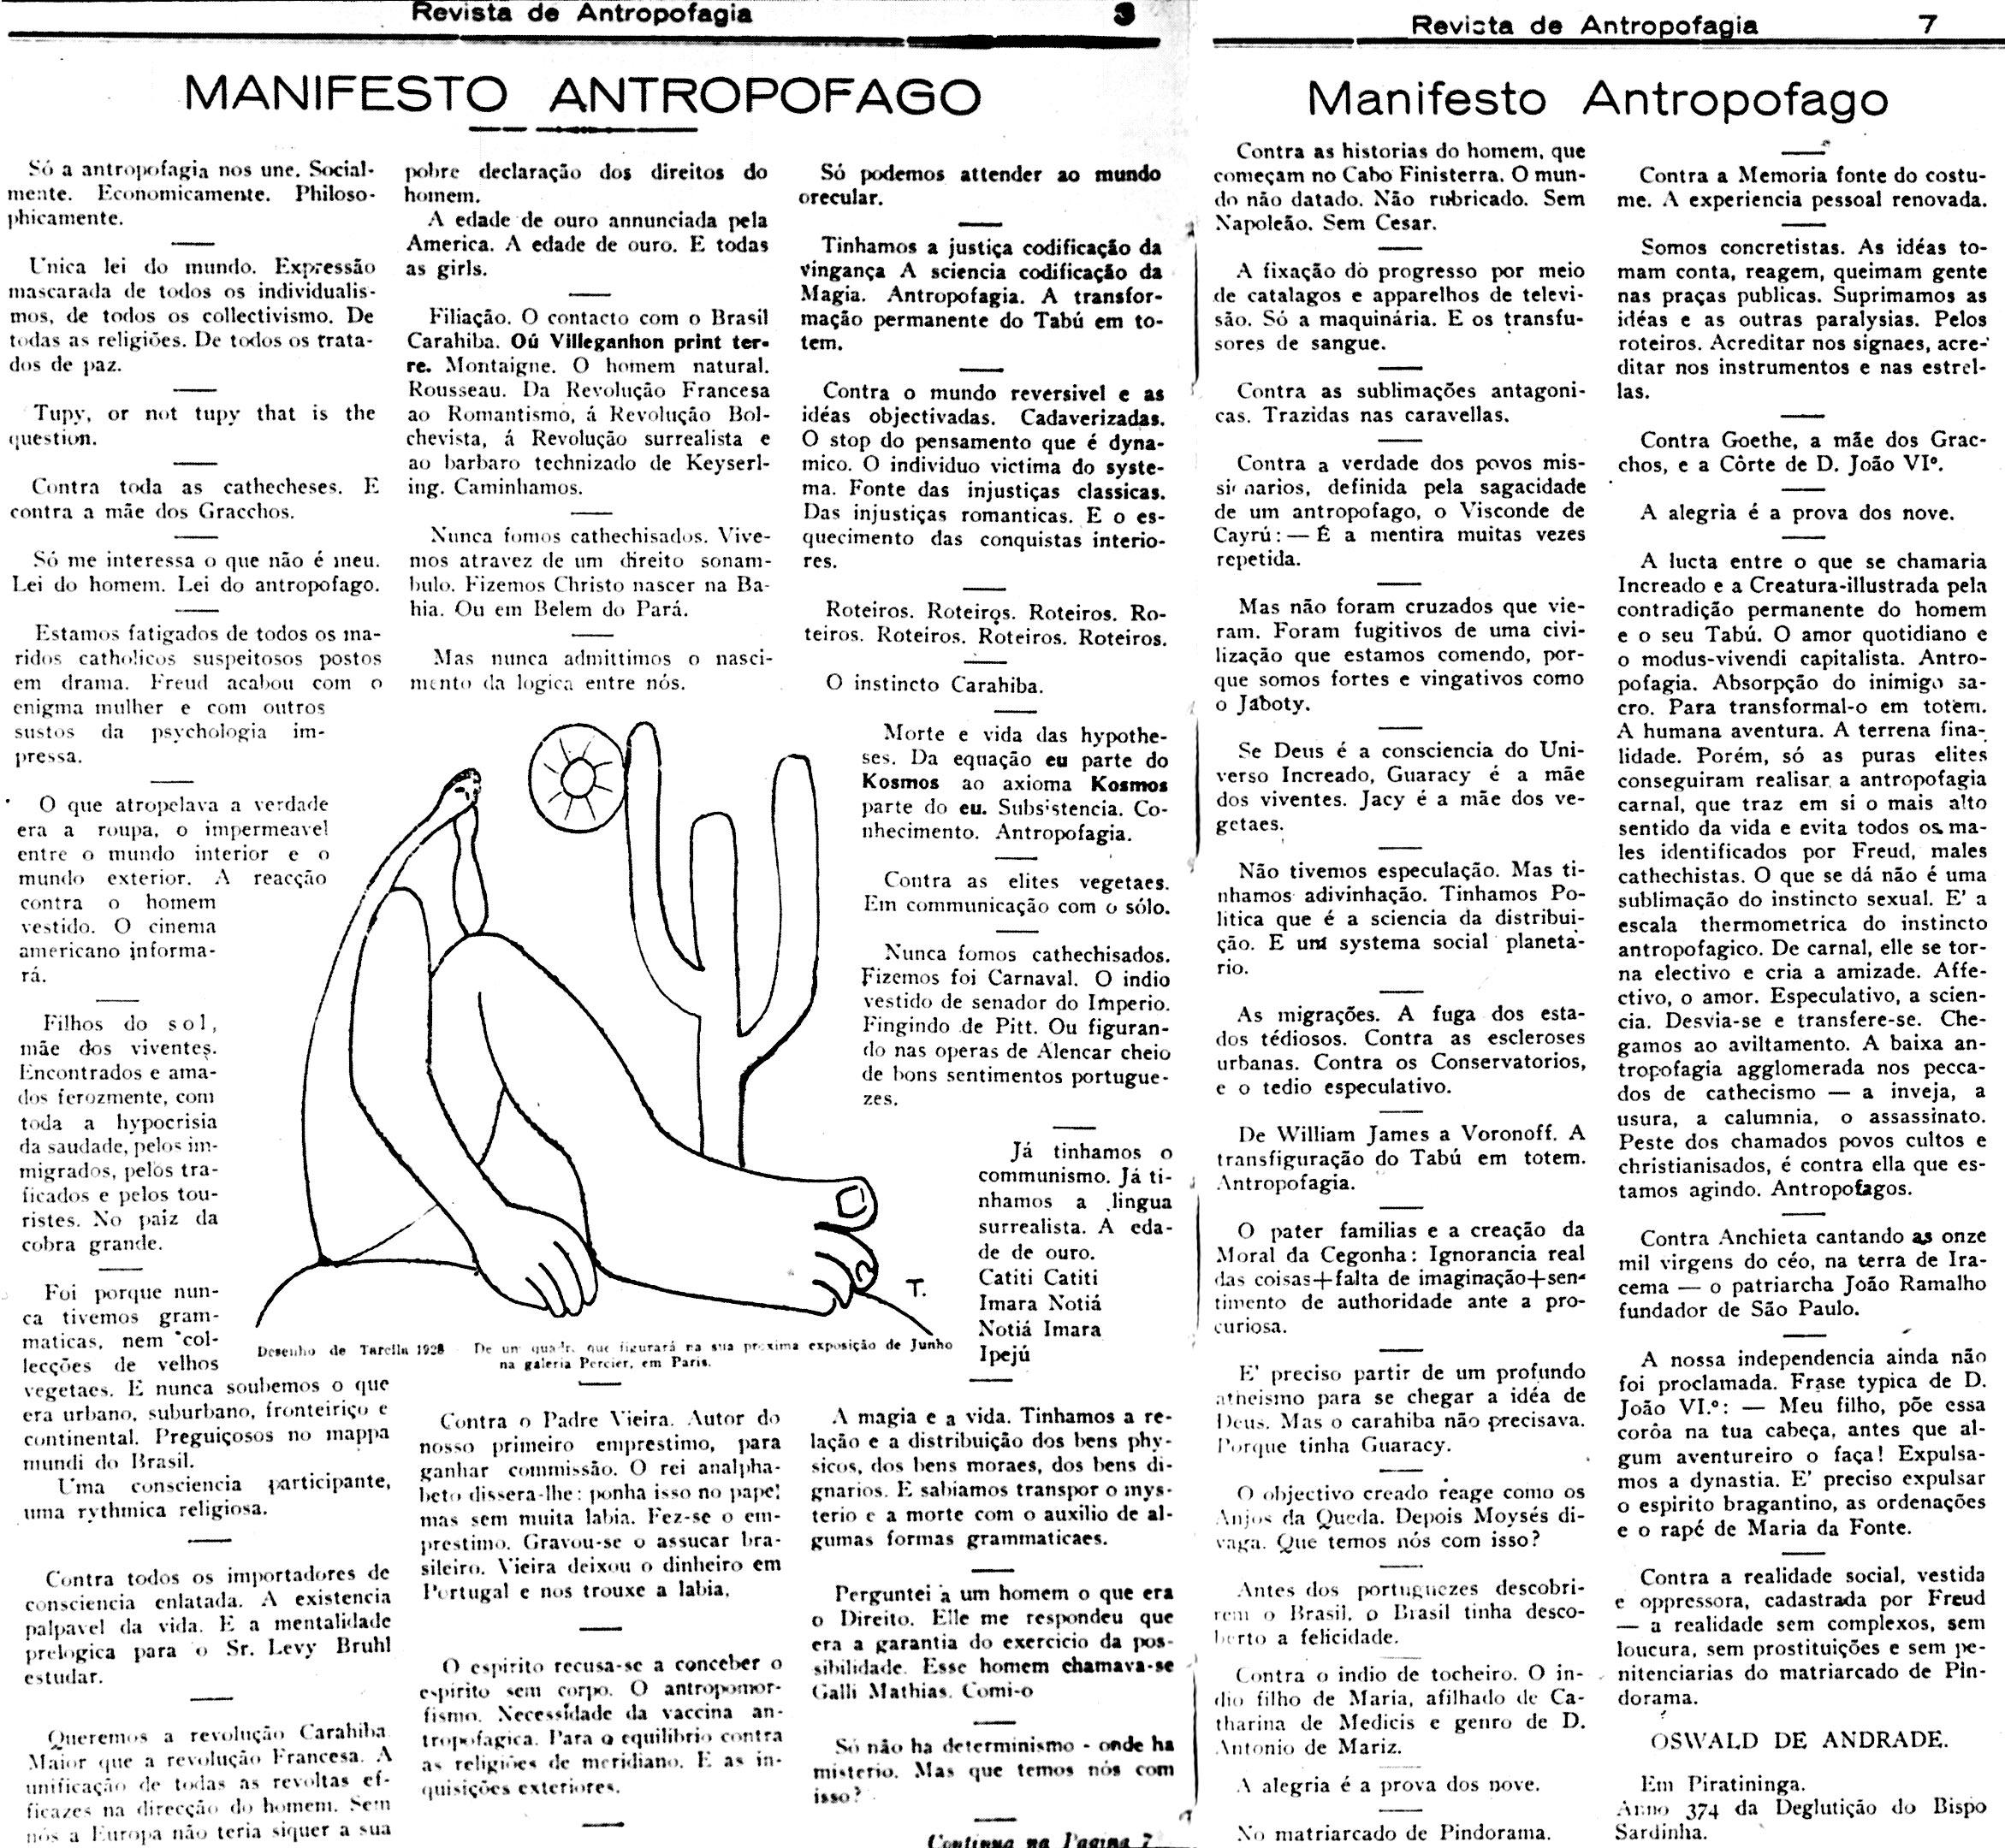 manifesto_antropofago_facsimile.jpg